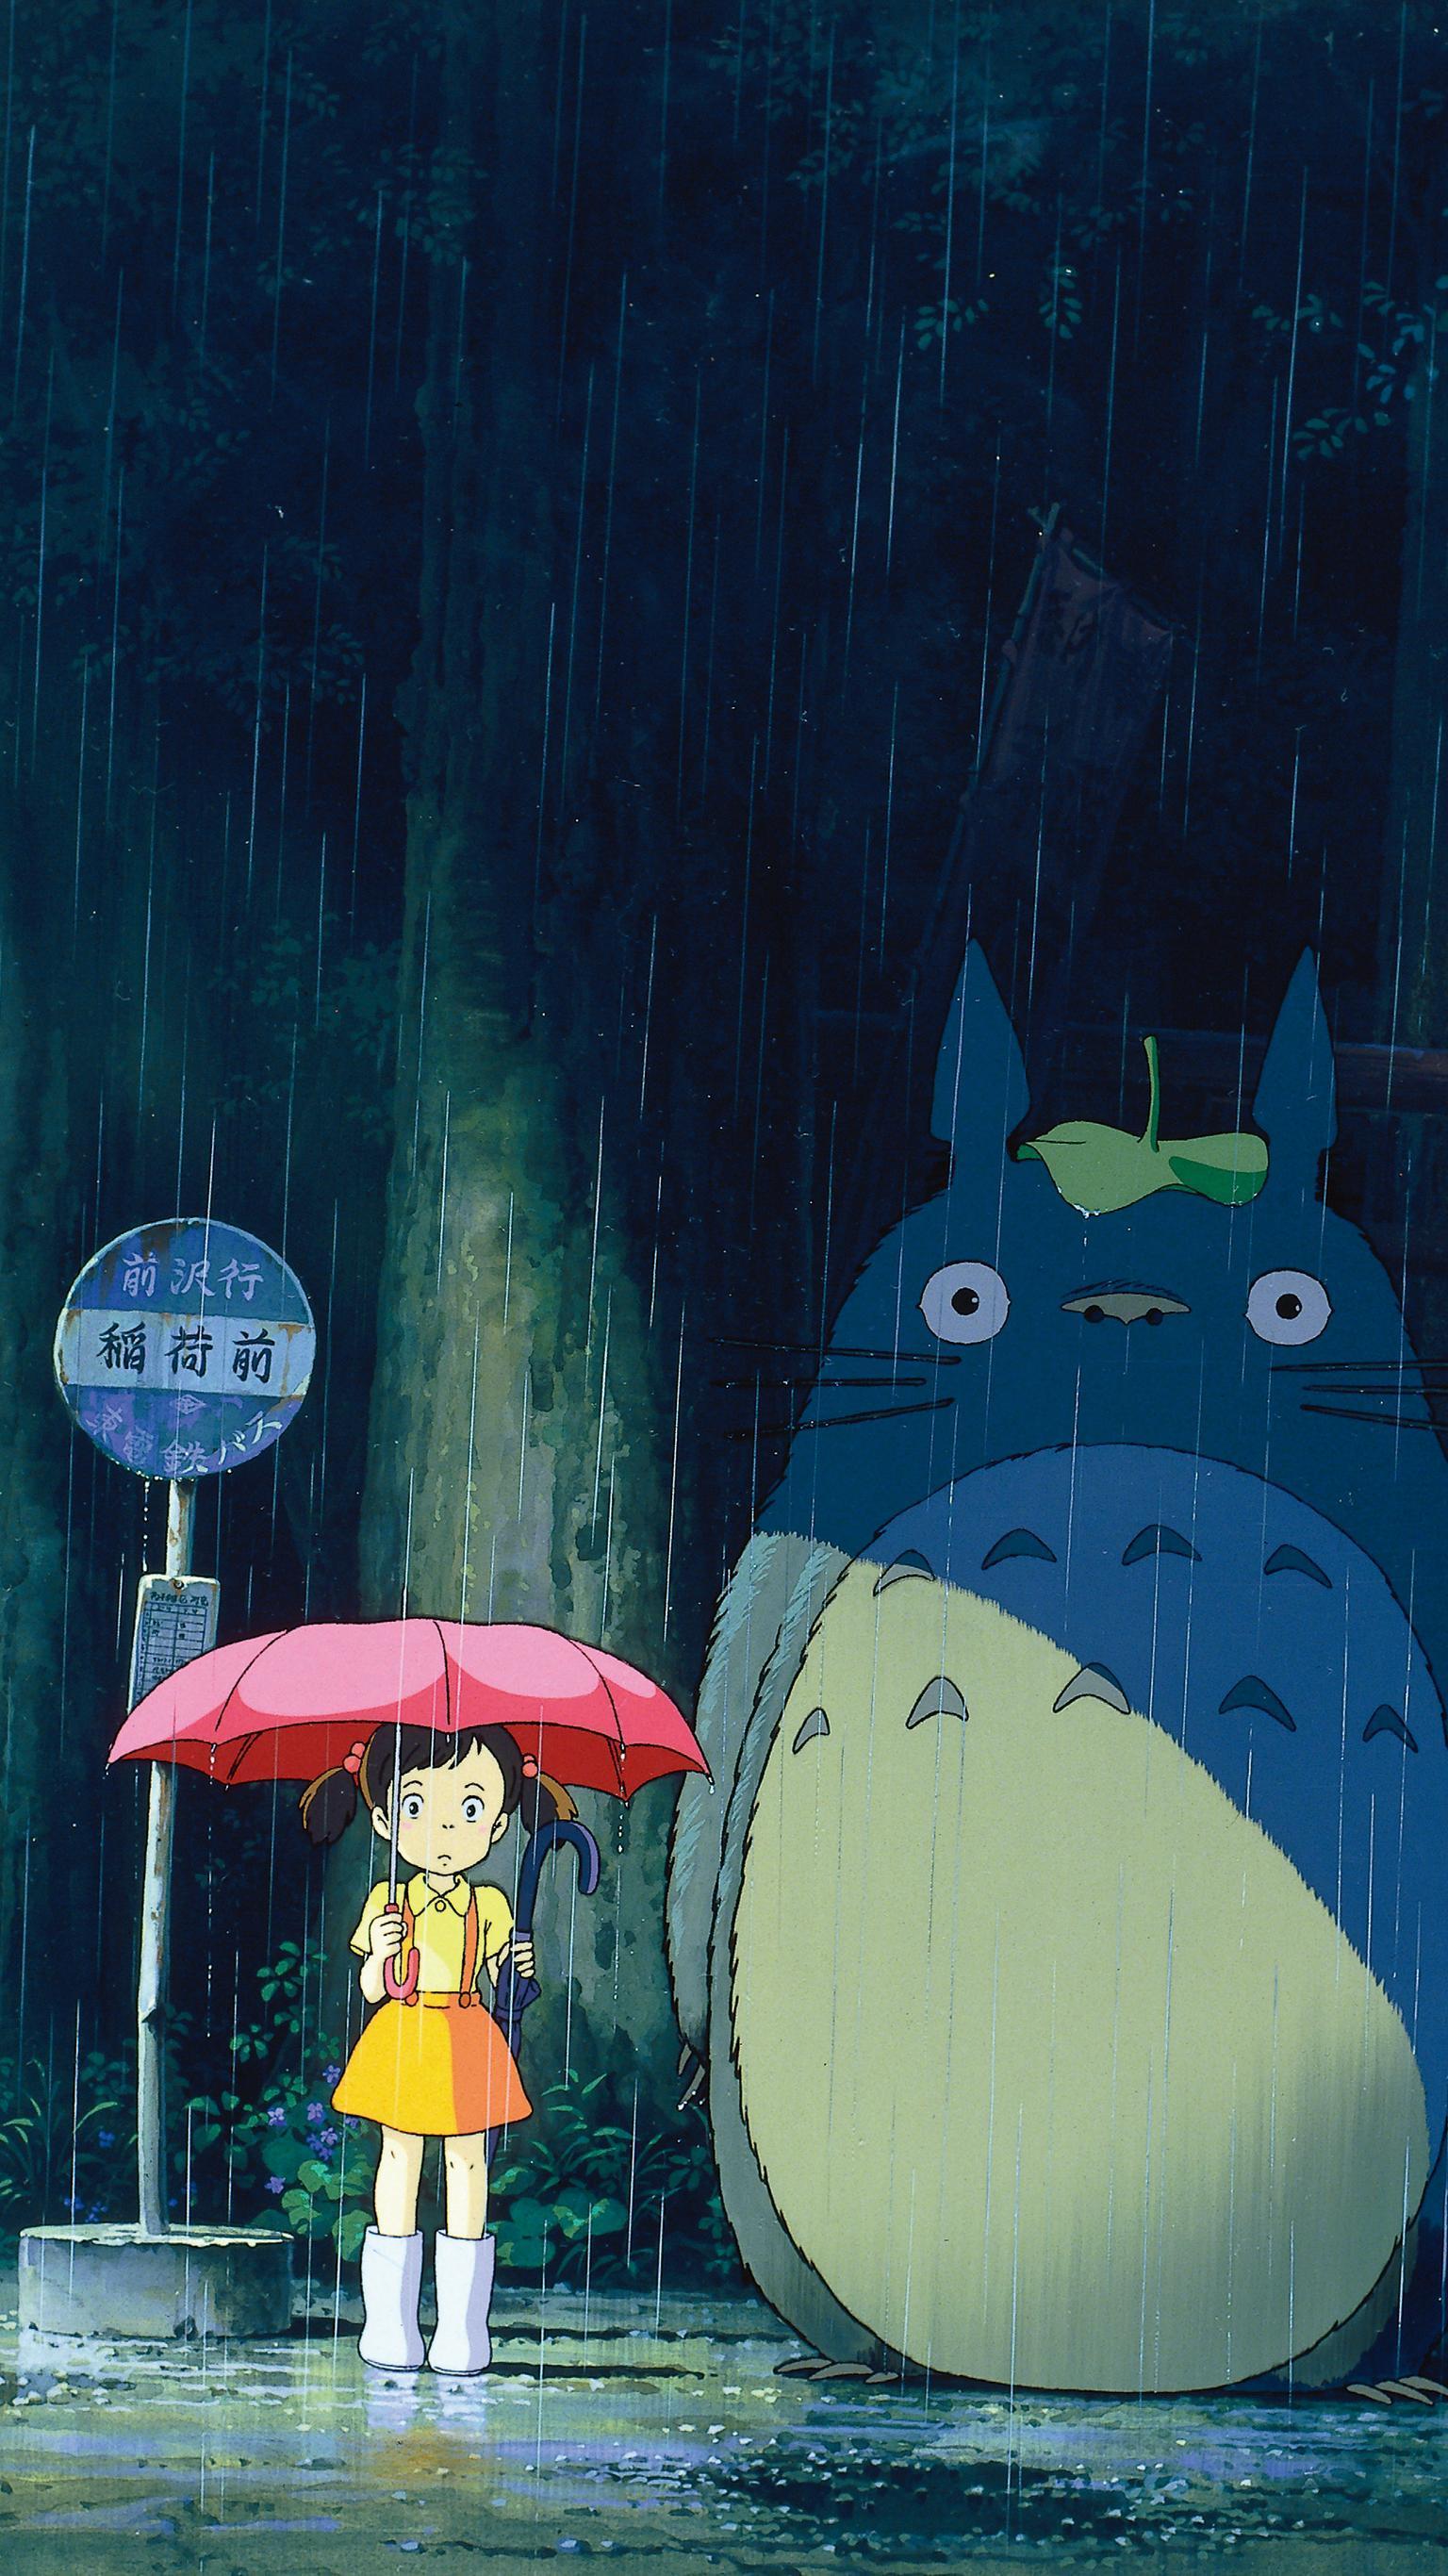 Totoro Phone Wallpapers Top Free Totoro Phone Backgrounds Wallpaperaccess